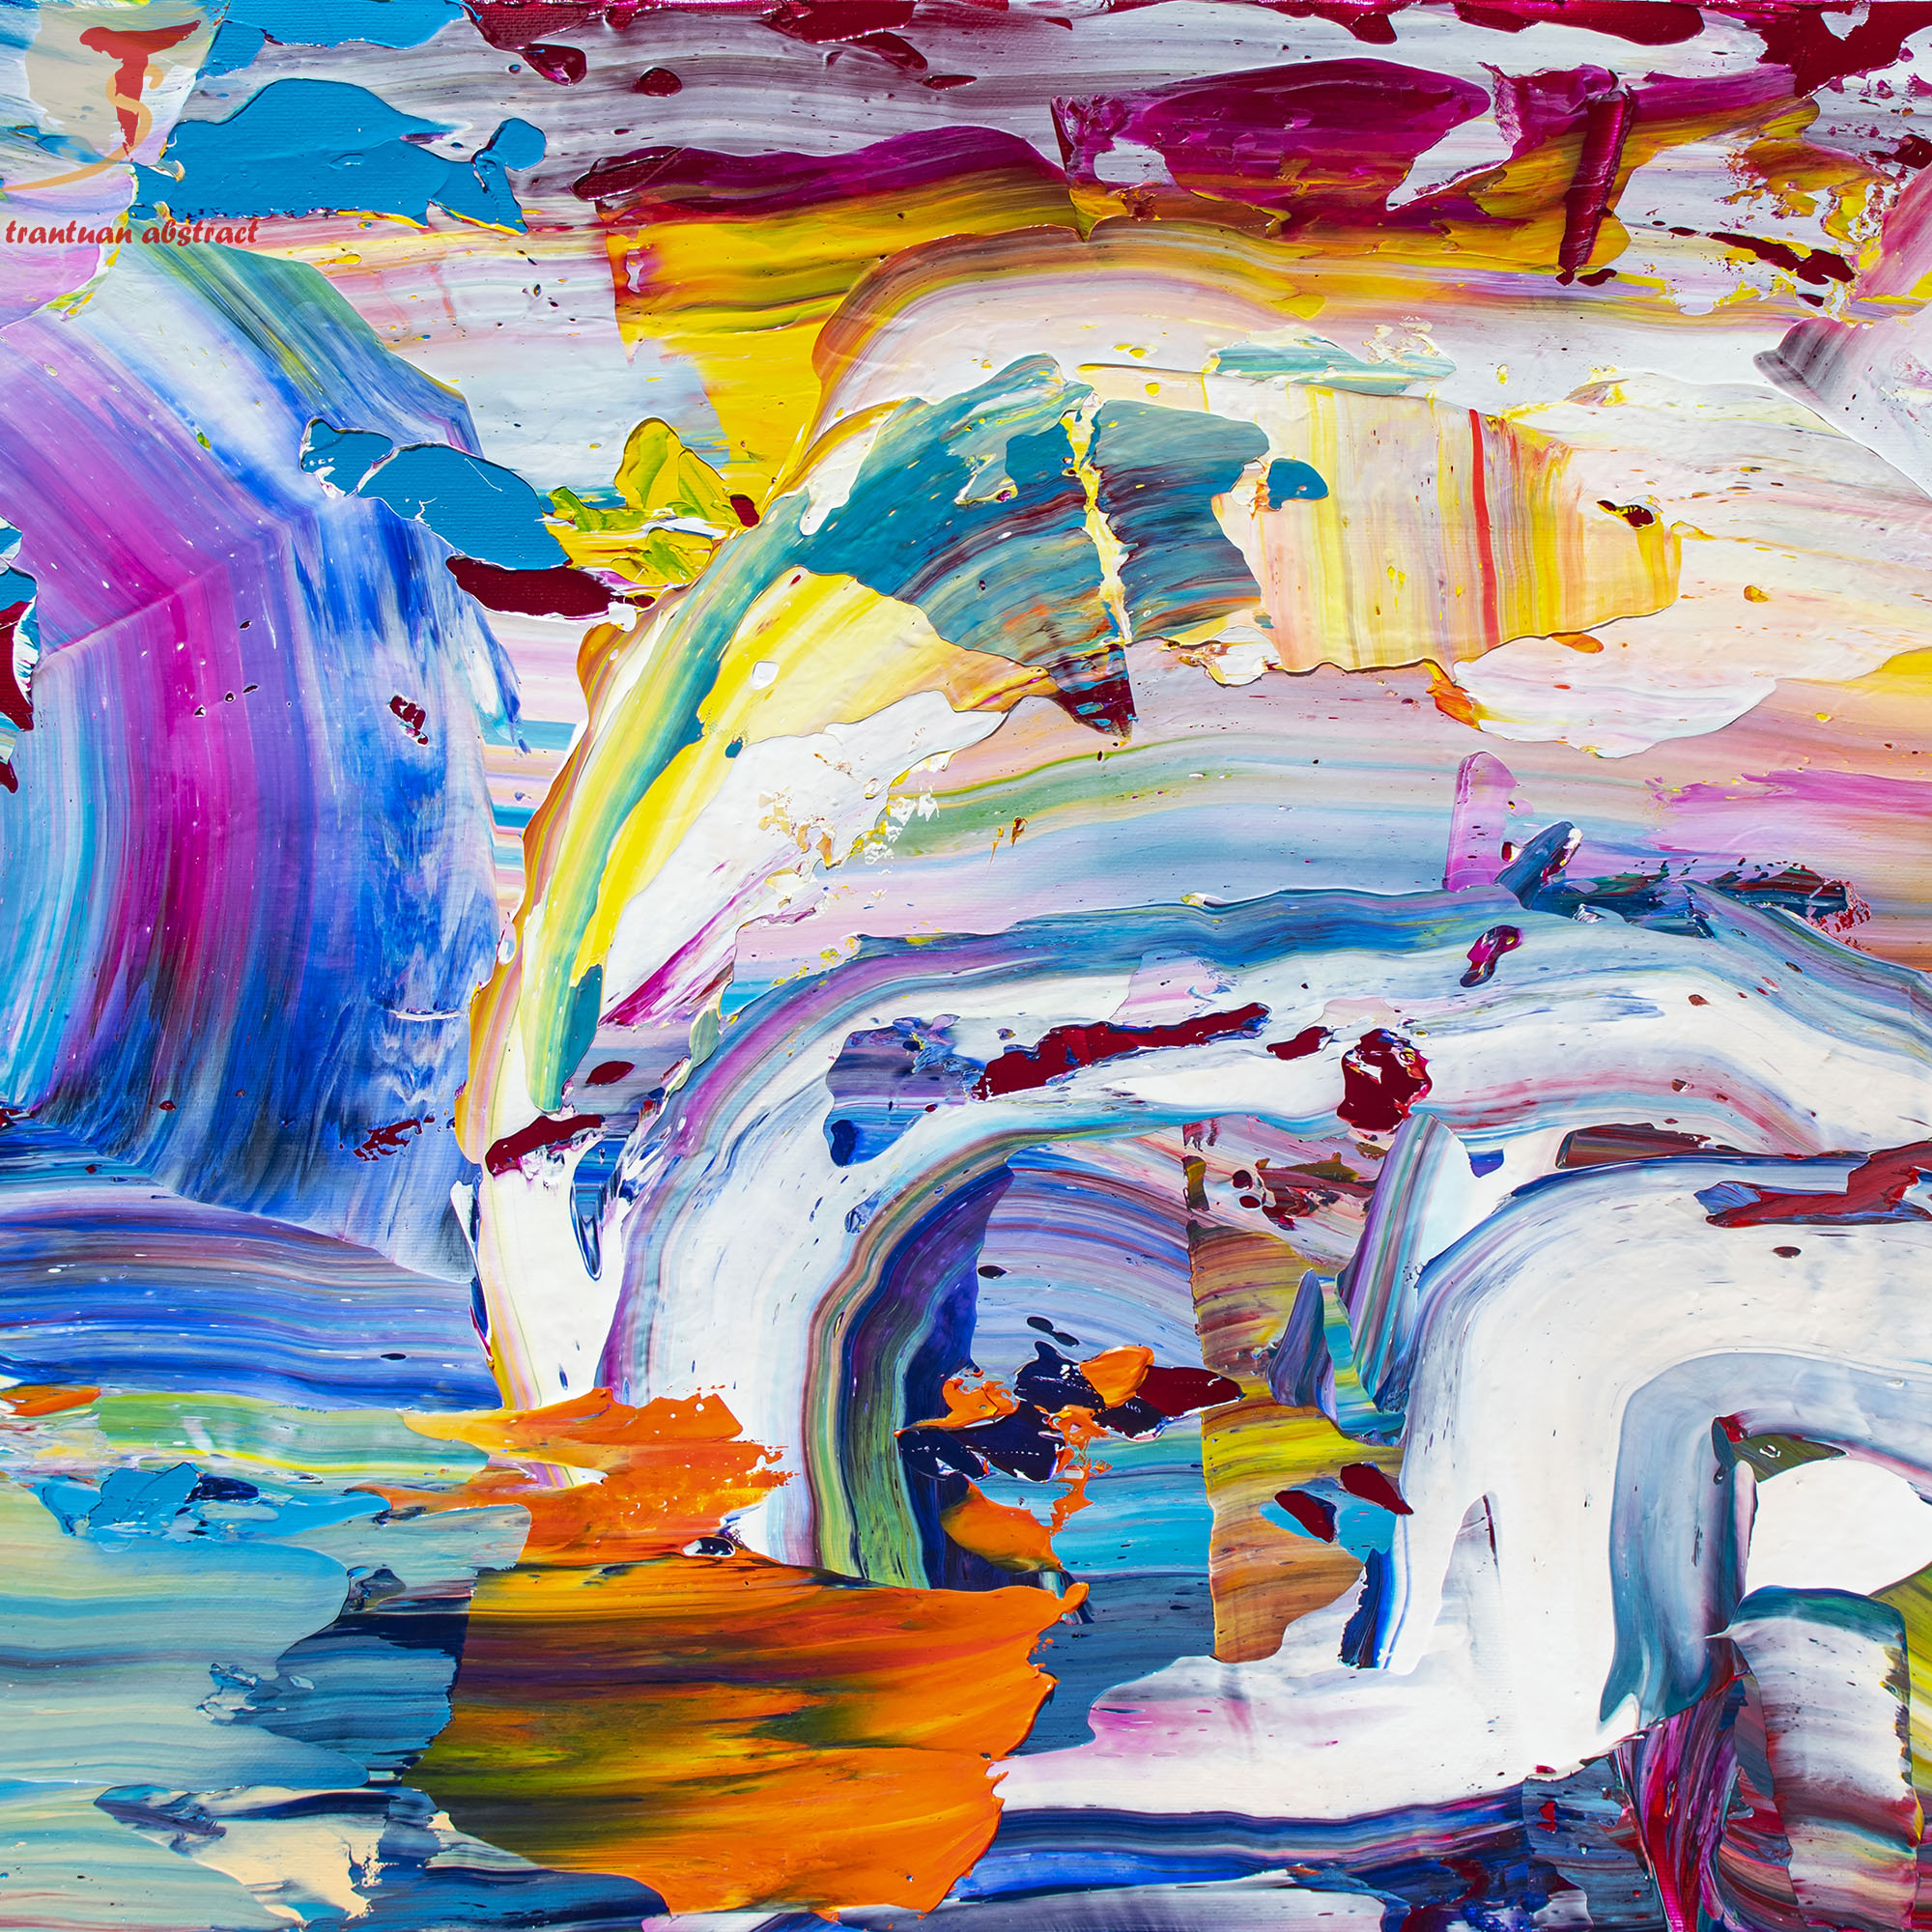 Tran Tuan Abstract Rainbow and Rain 2021 135 x 80 x 5 cm Acrylic on Canvas Painting Detail (1)